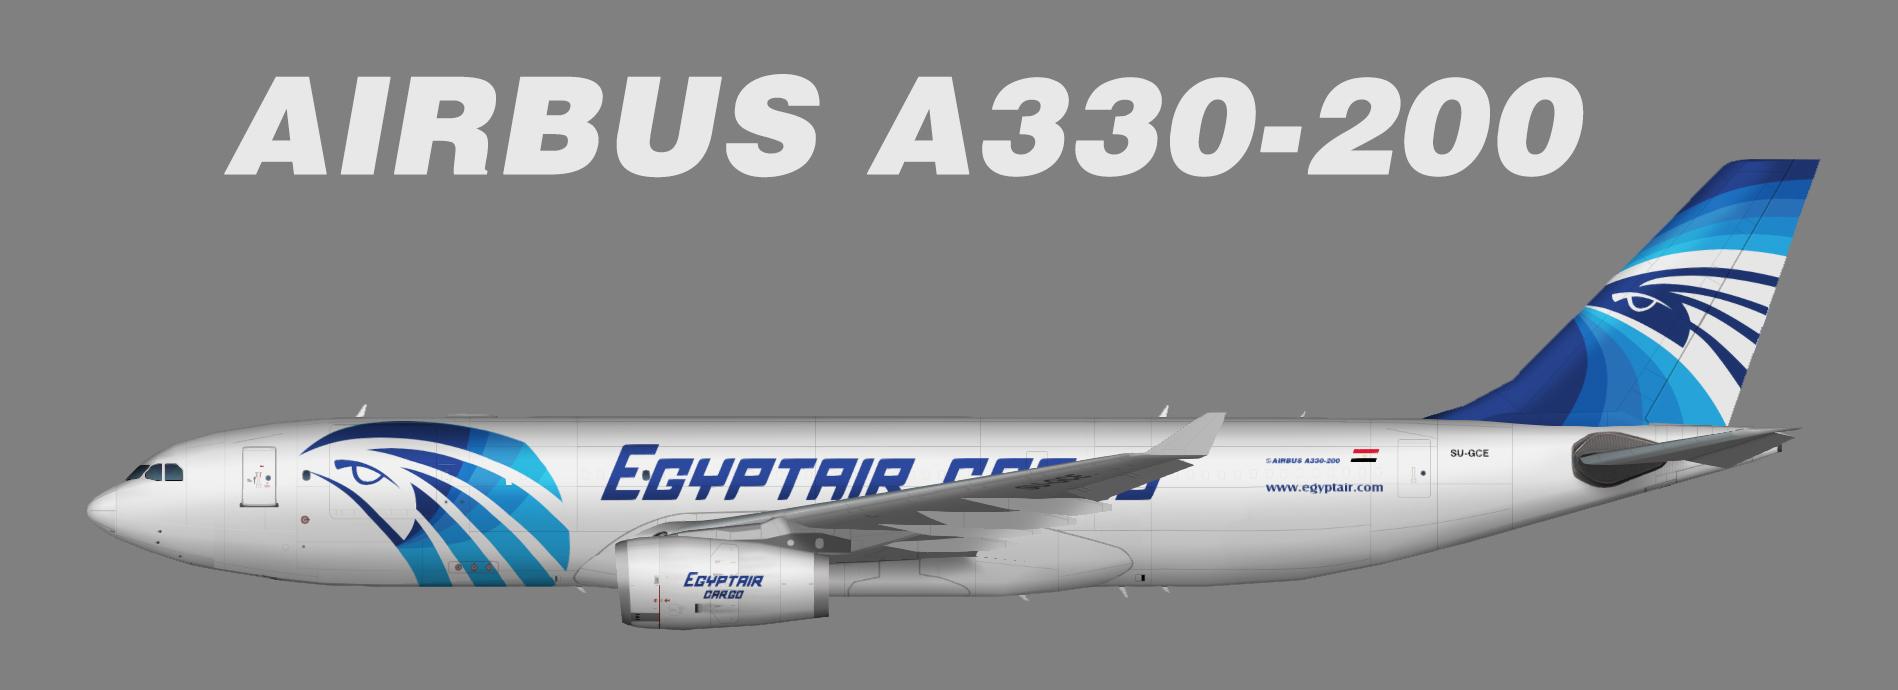 Egyptair Cargo Airbus A330-200P2F